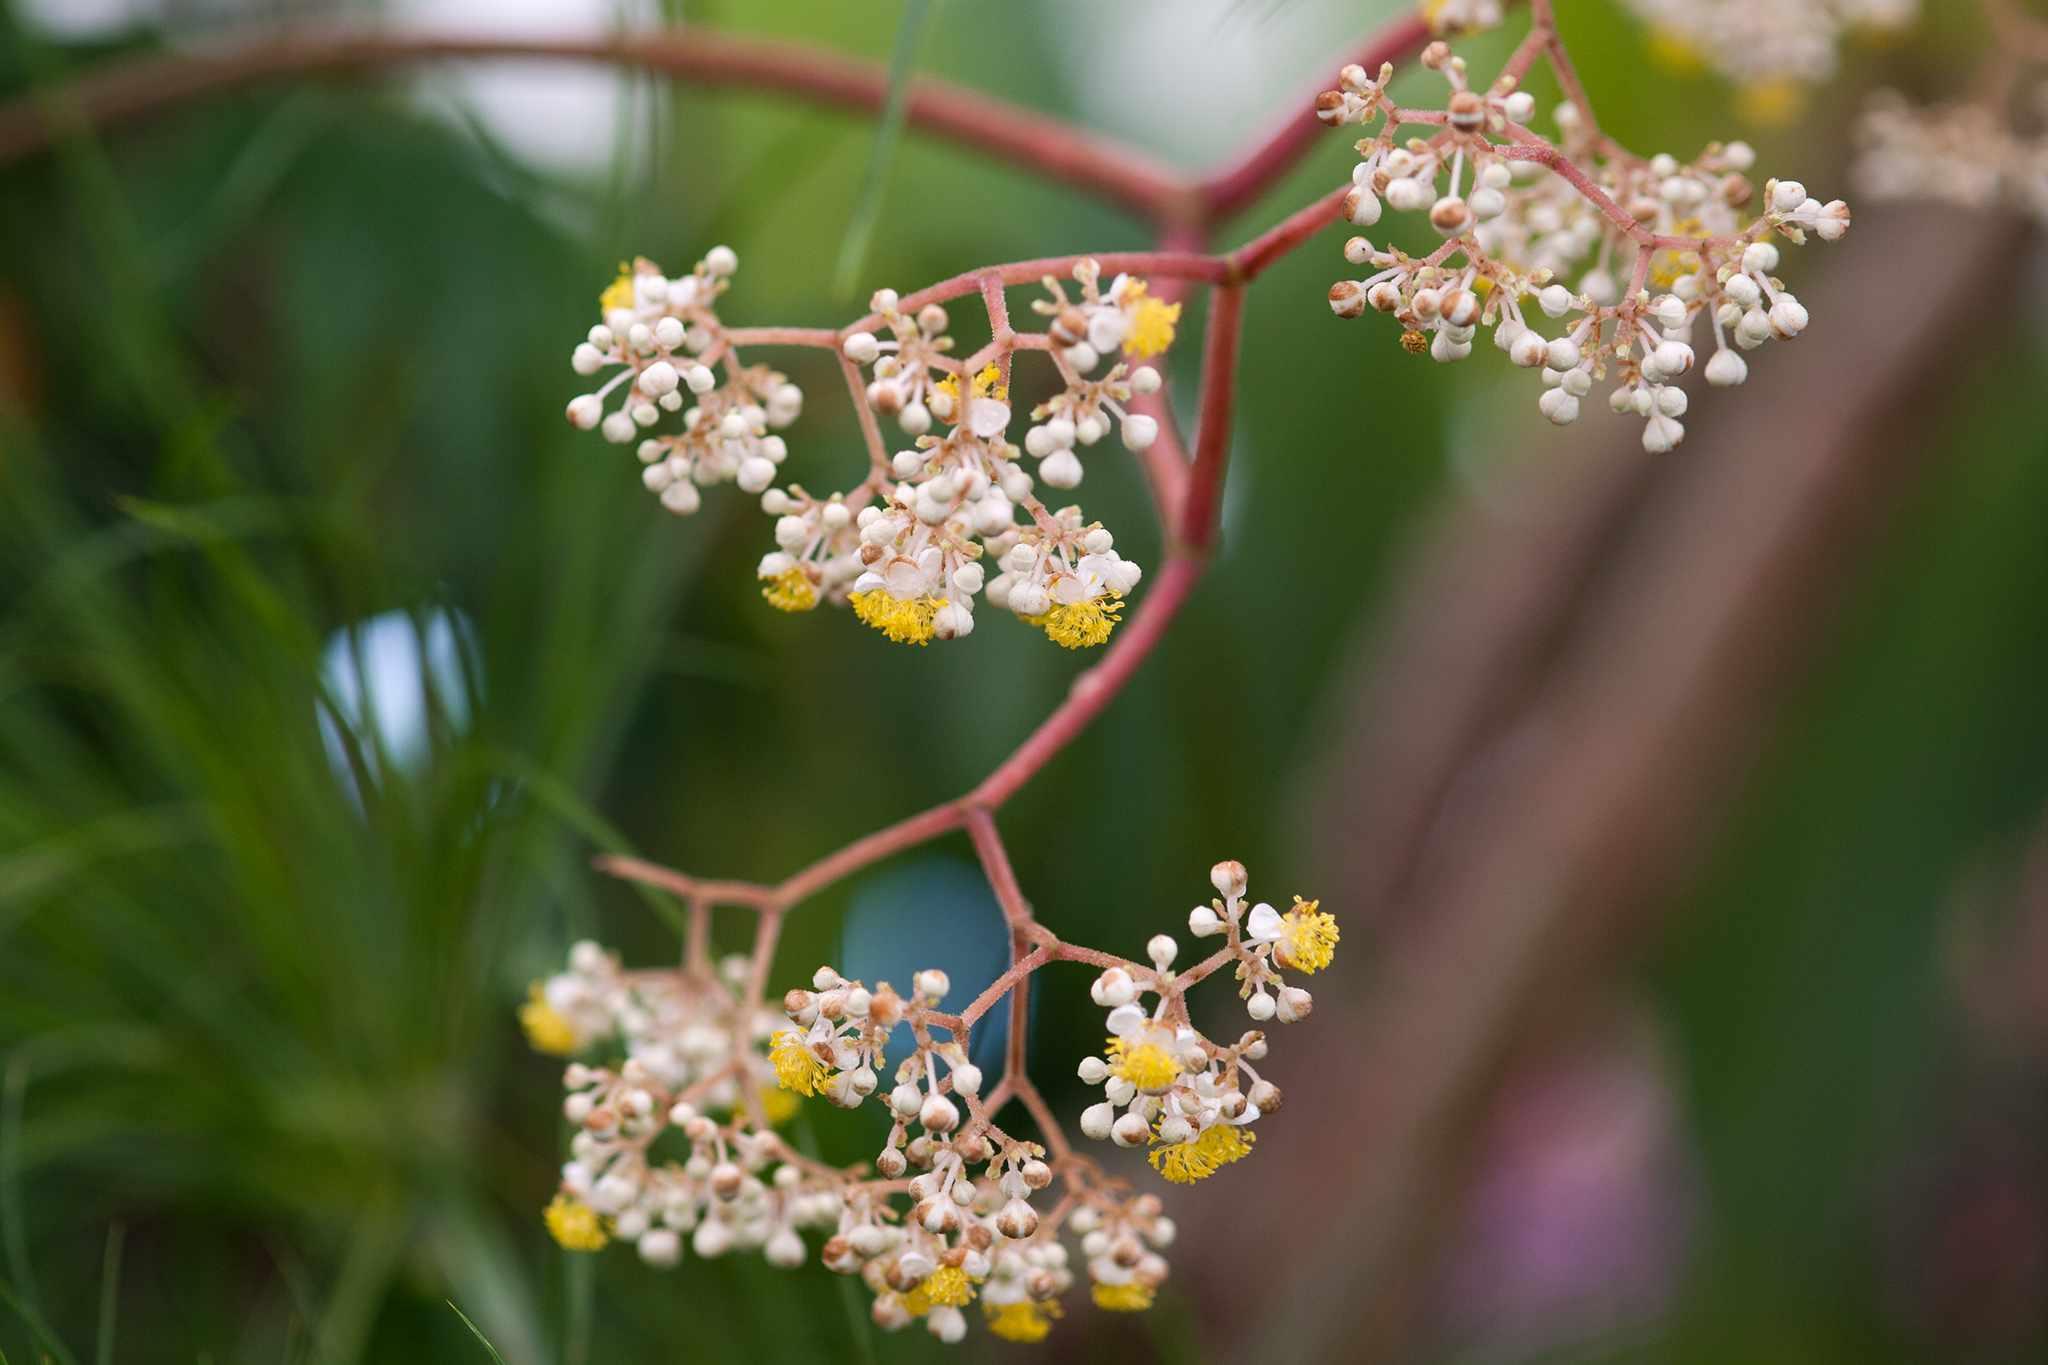 Begonia luxurians flowers